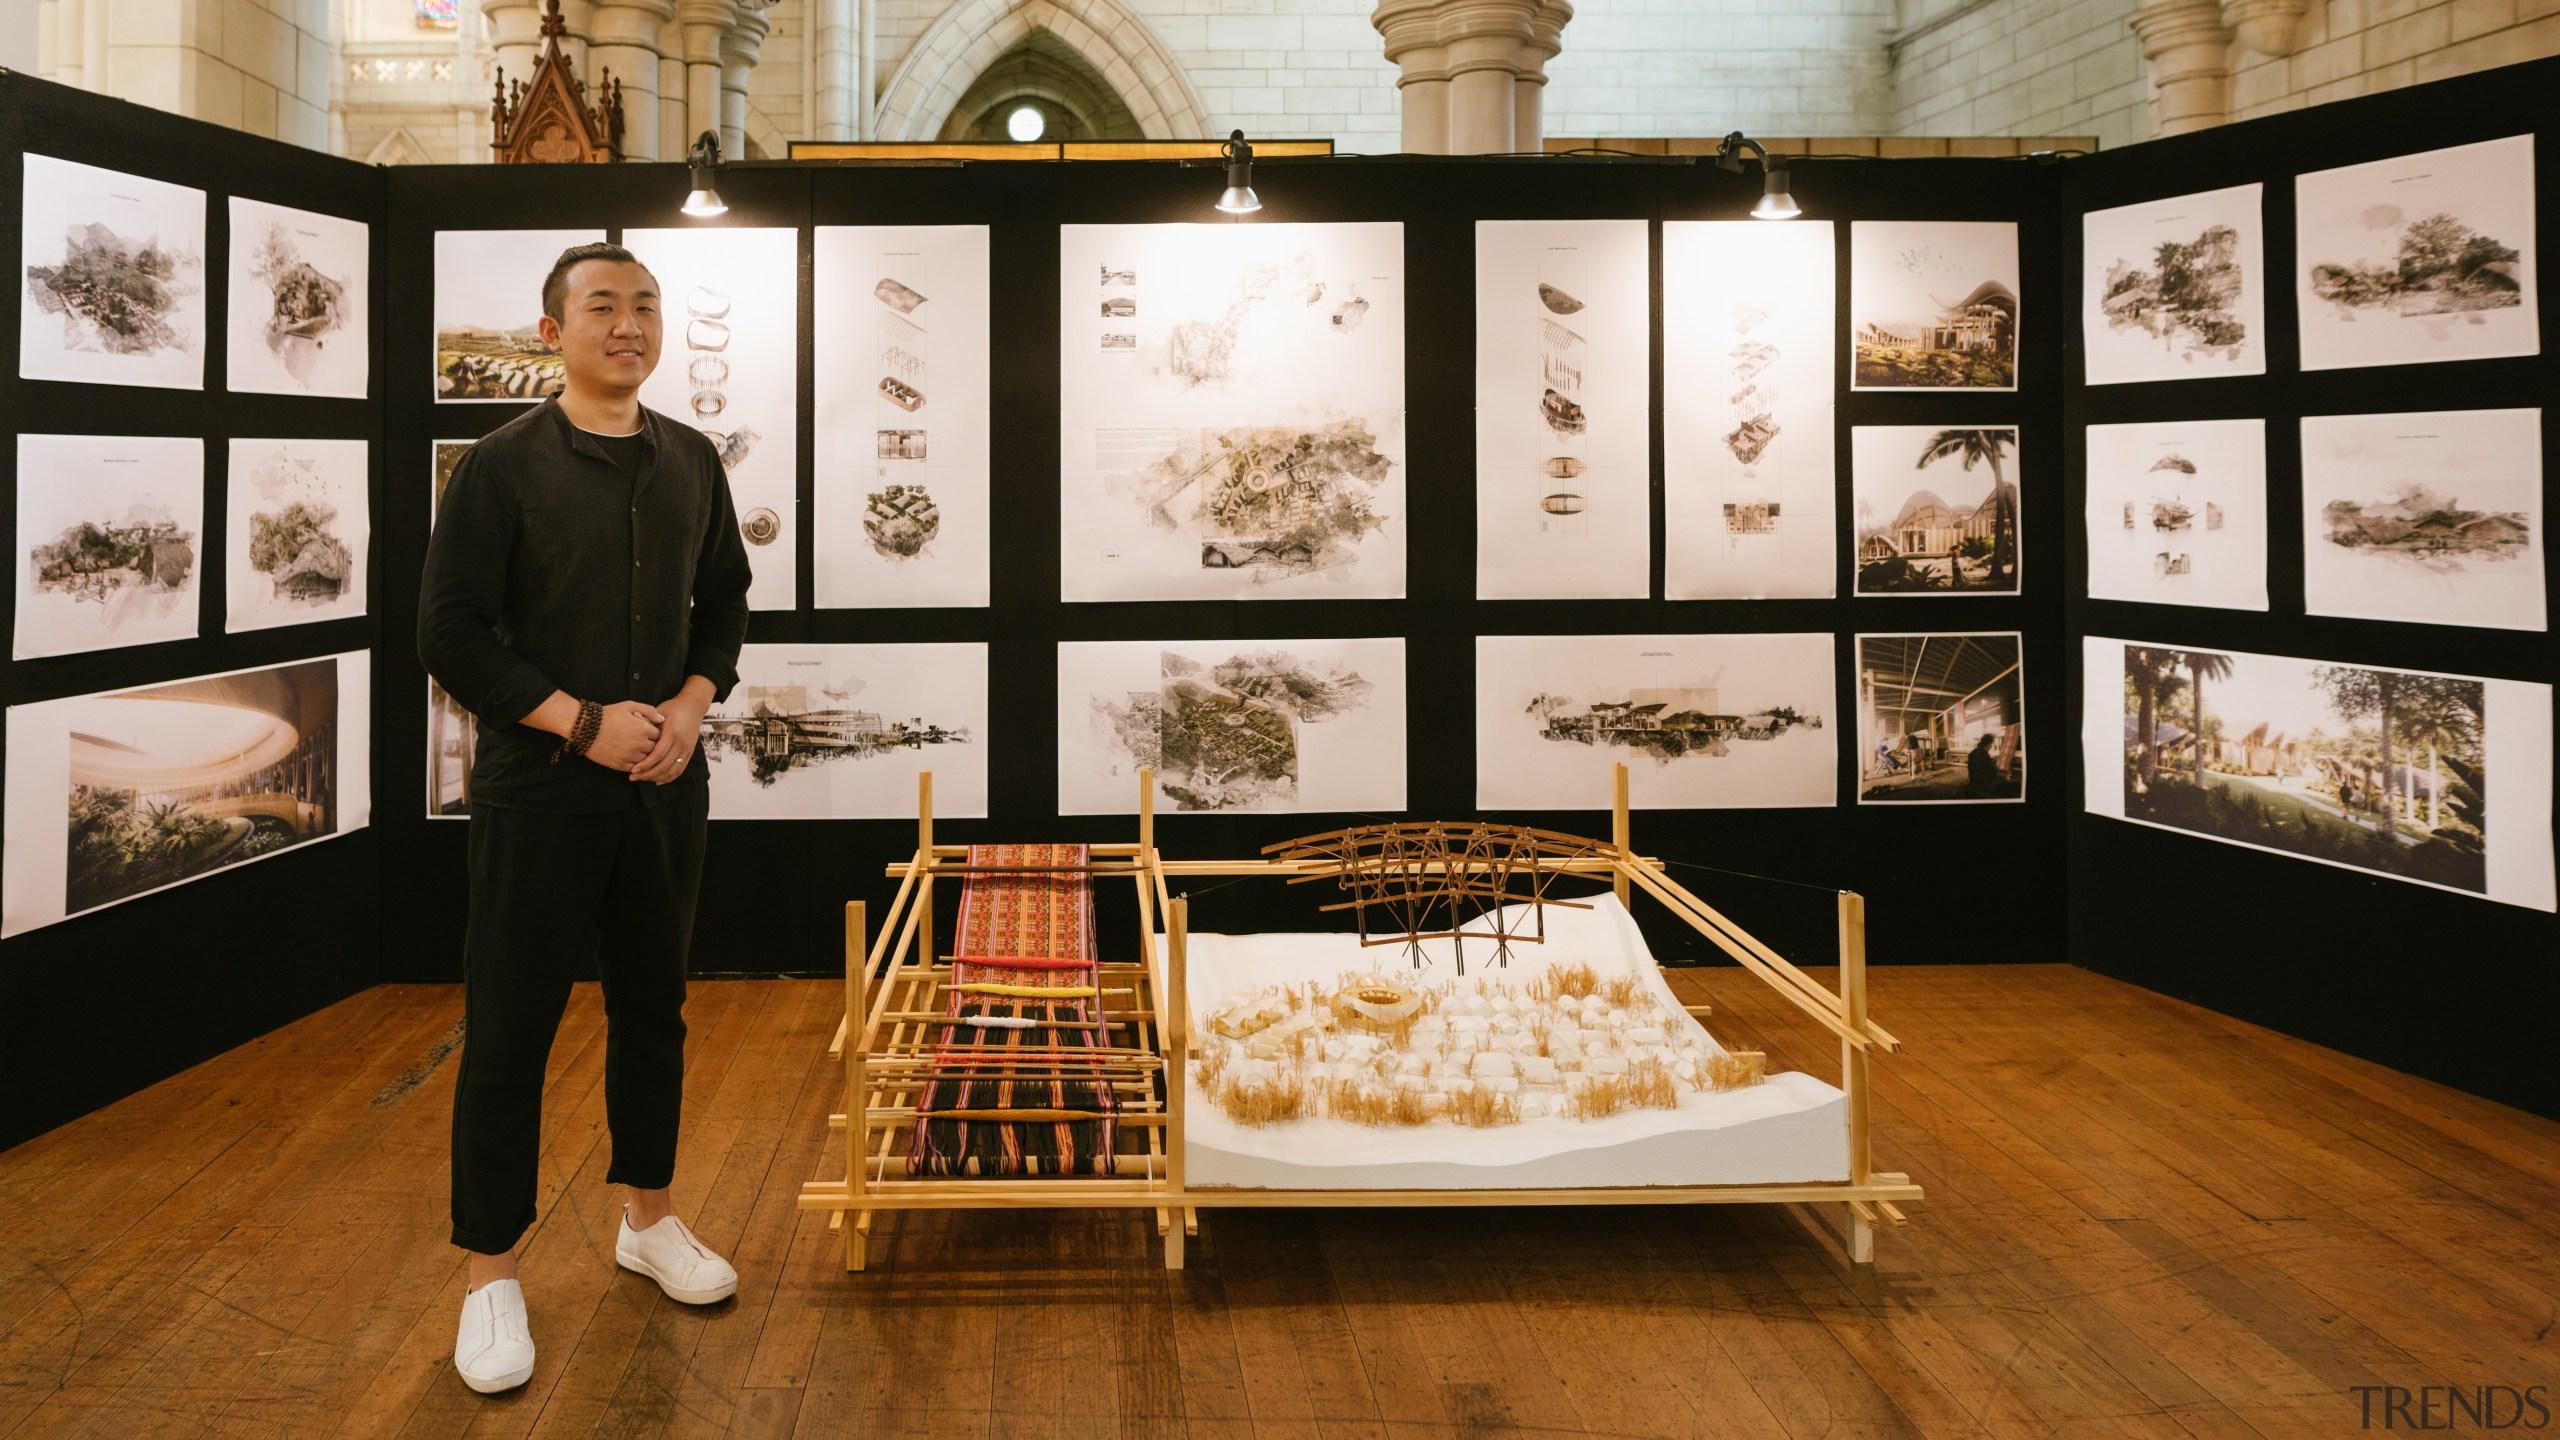 Jintao Yang – University Of Auckland – finalist art exhibition, collection, design, exhibition, furniture, interior design, brown, black, white